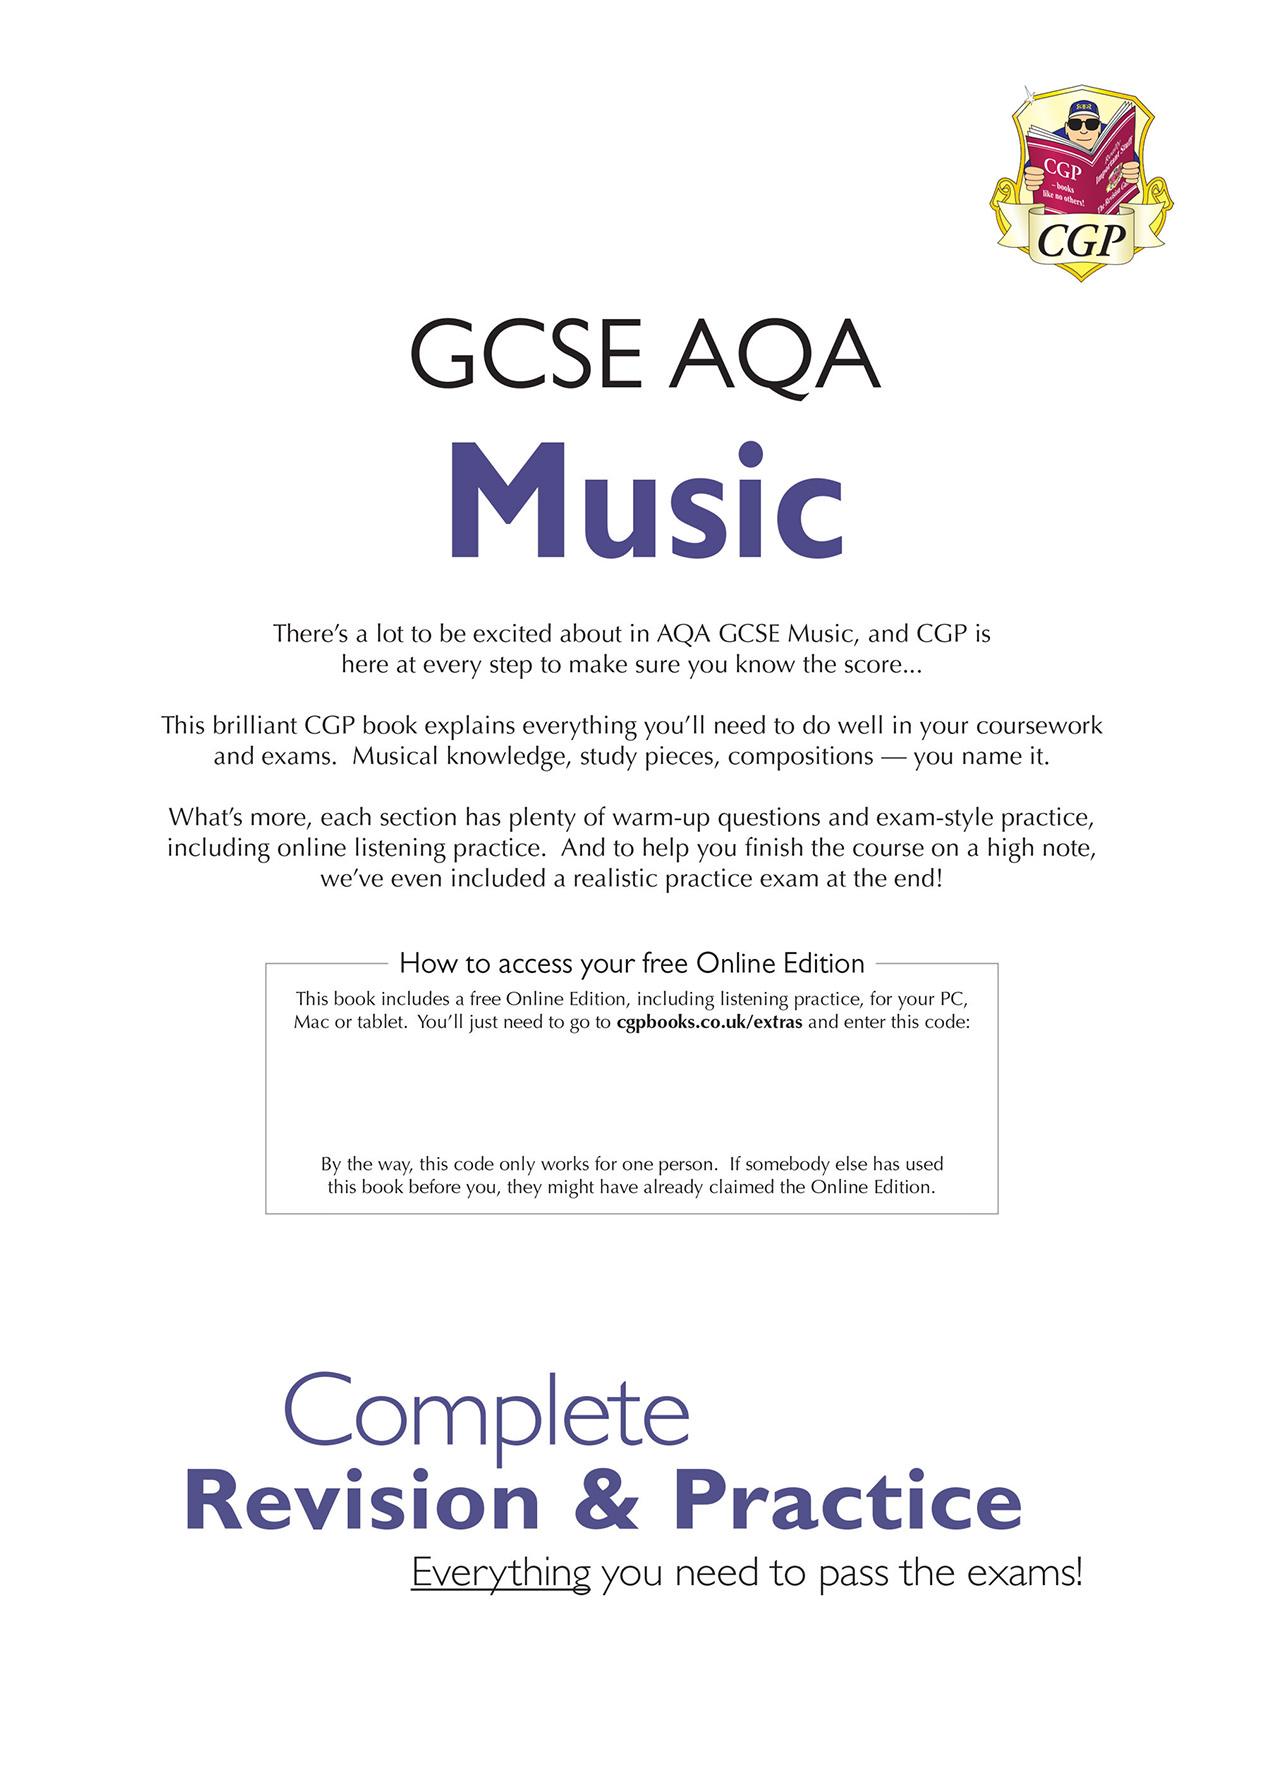 Aqa gcse music coursework fire department cover letter templates